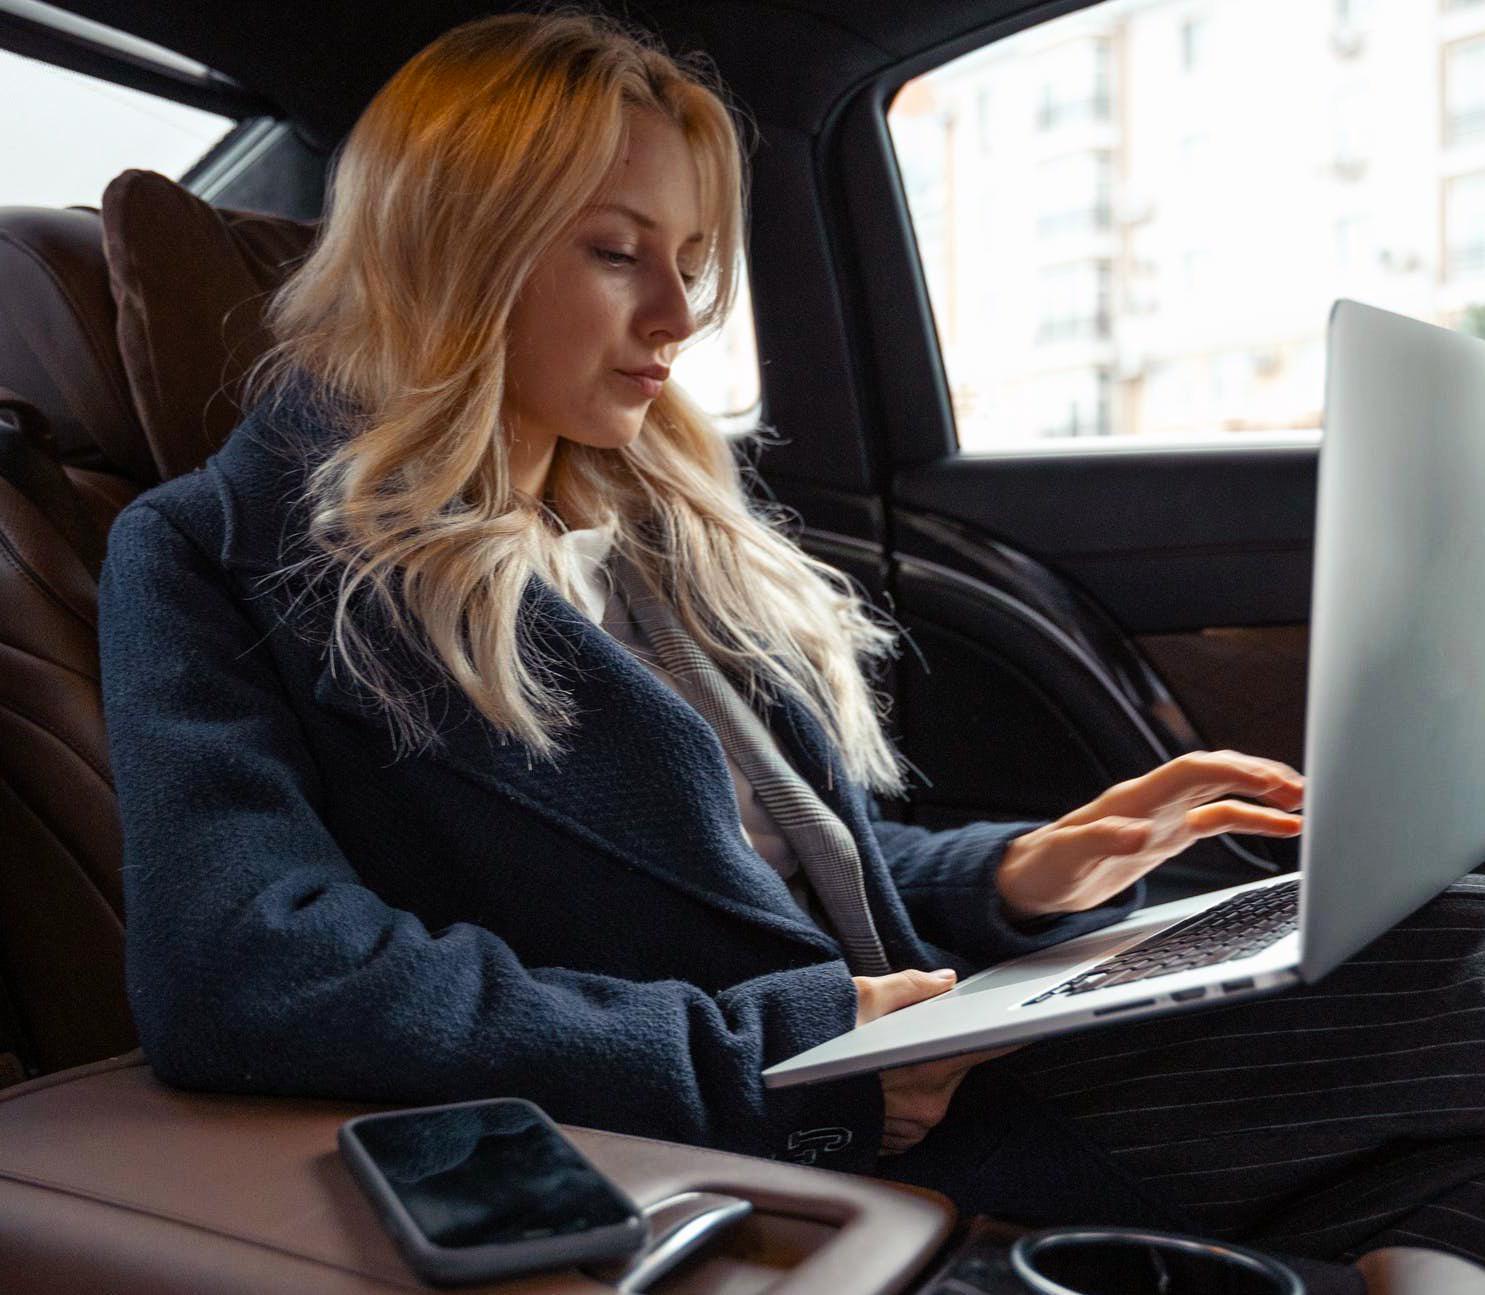 working-in-car.jpg